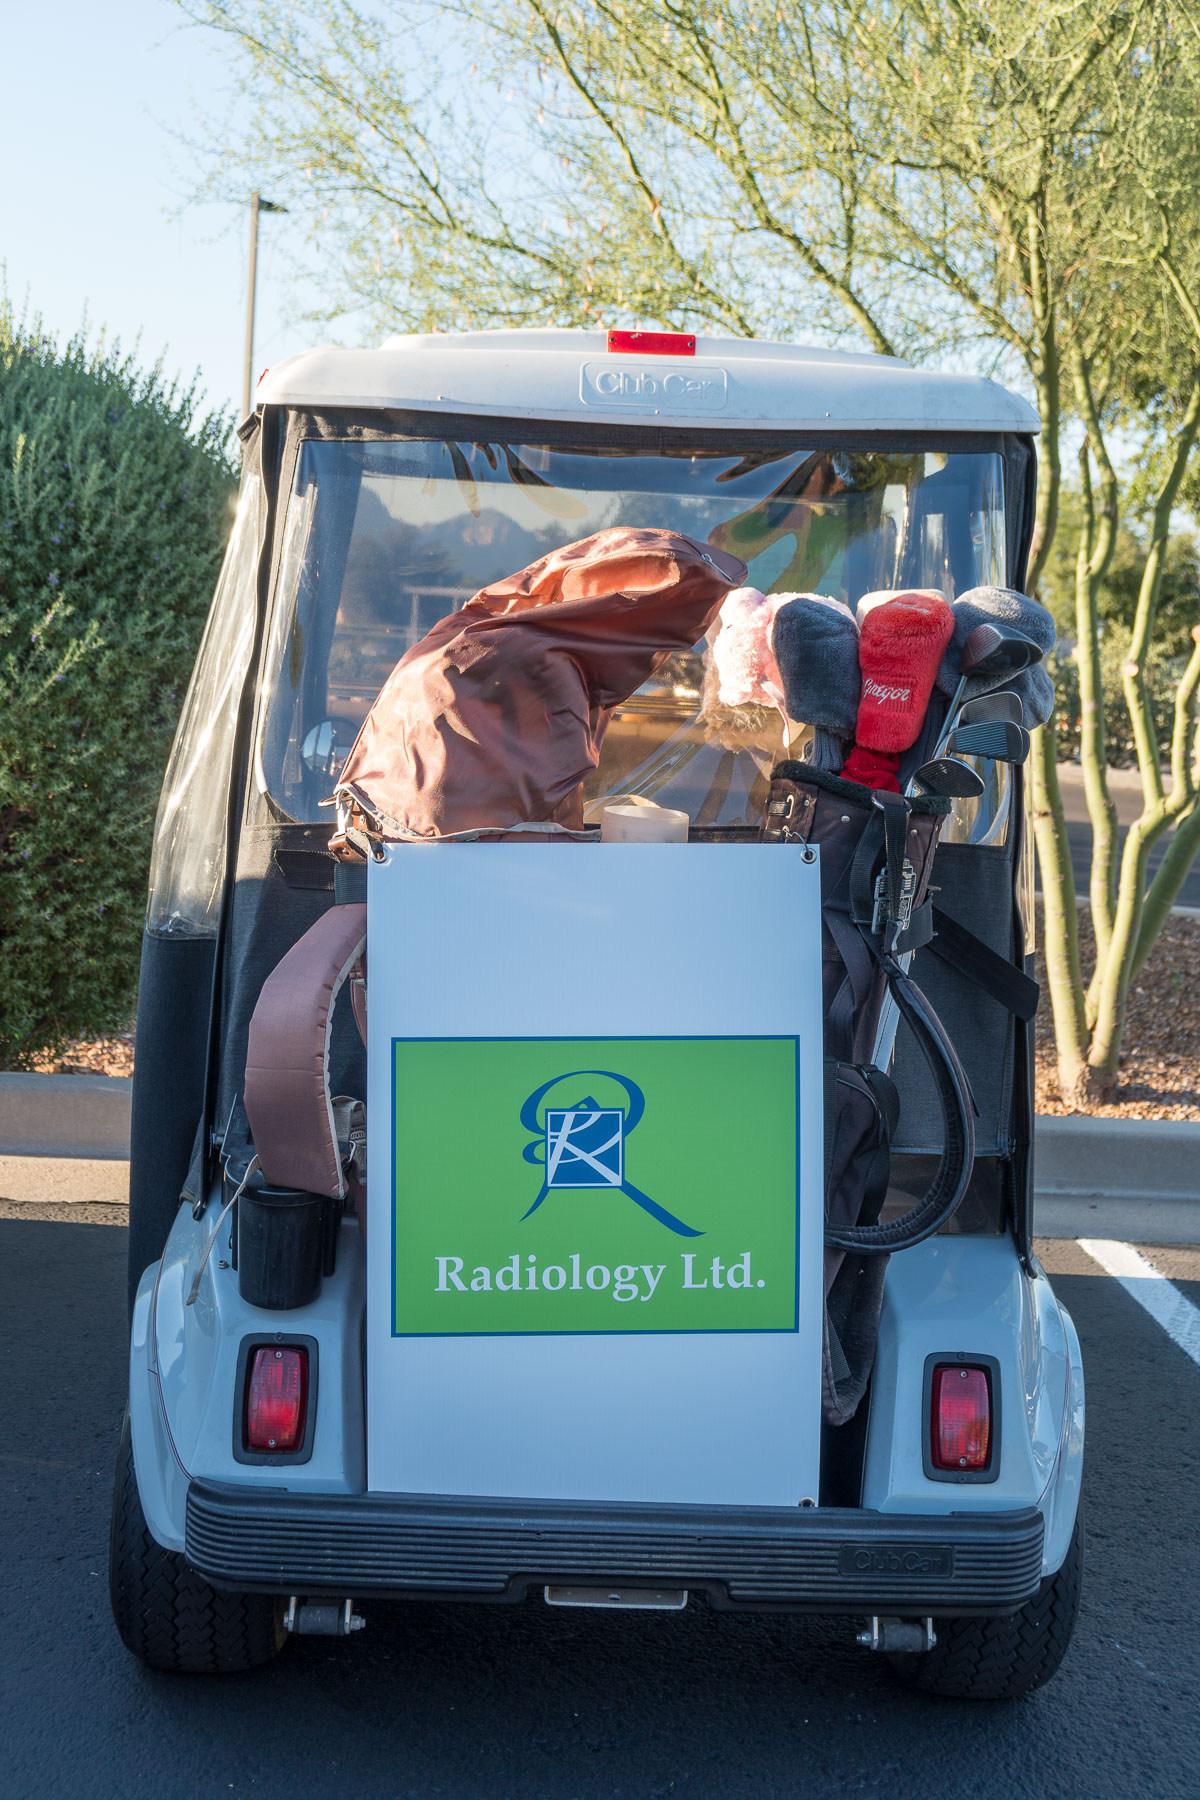 Radiology Ltd